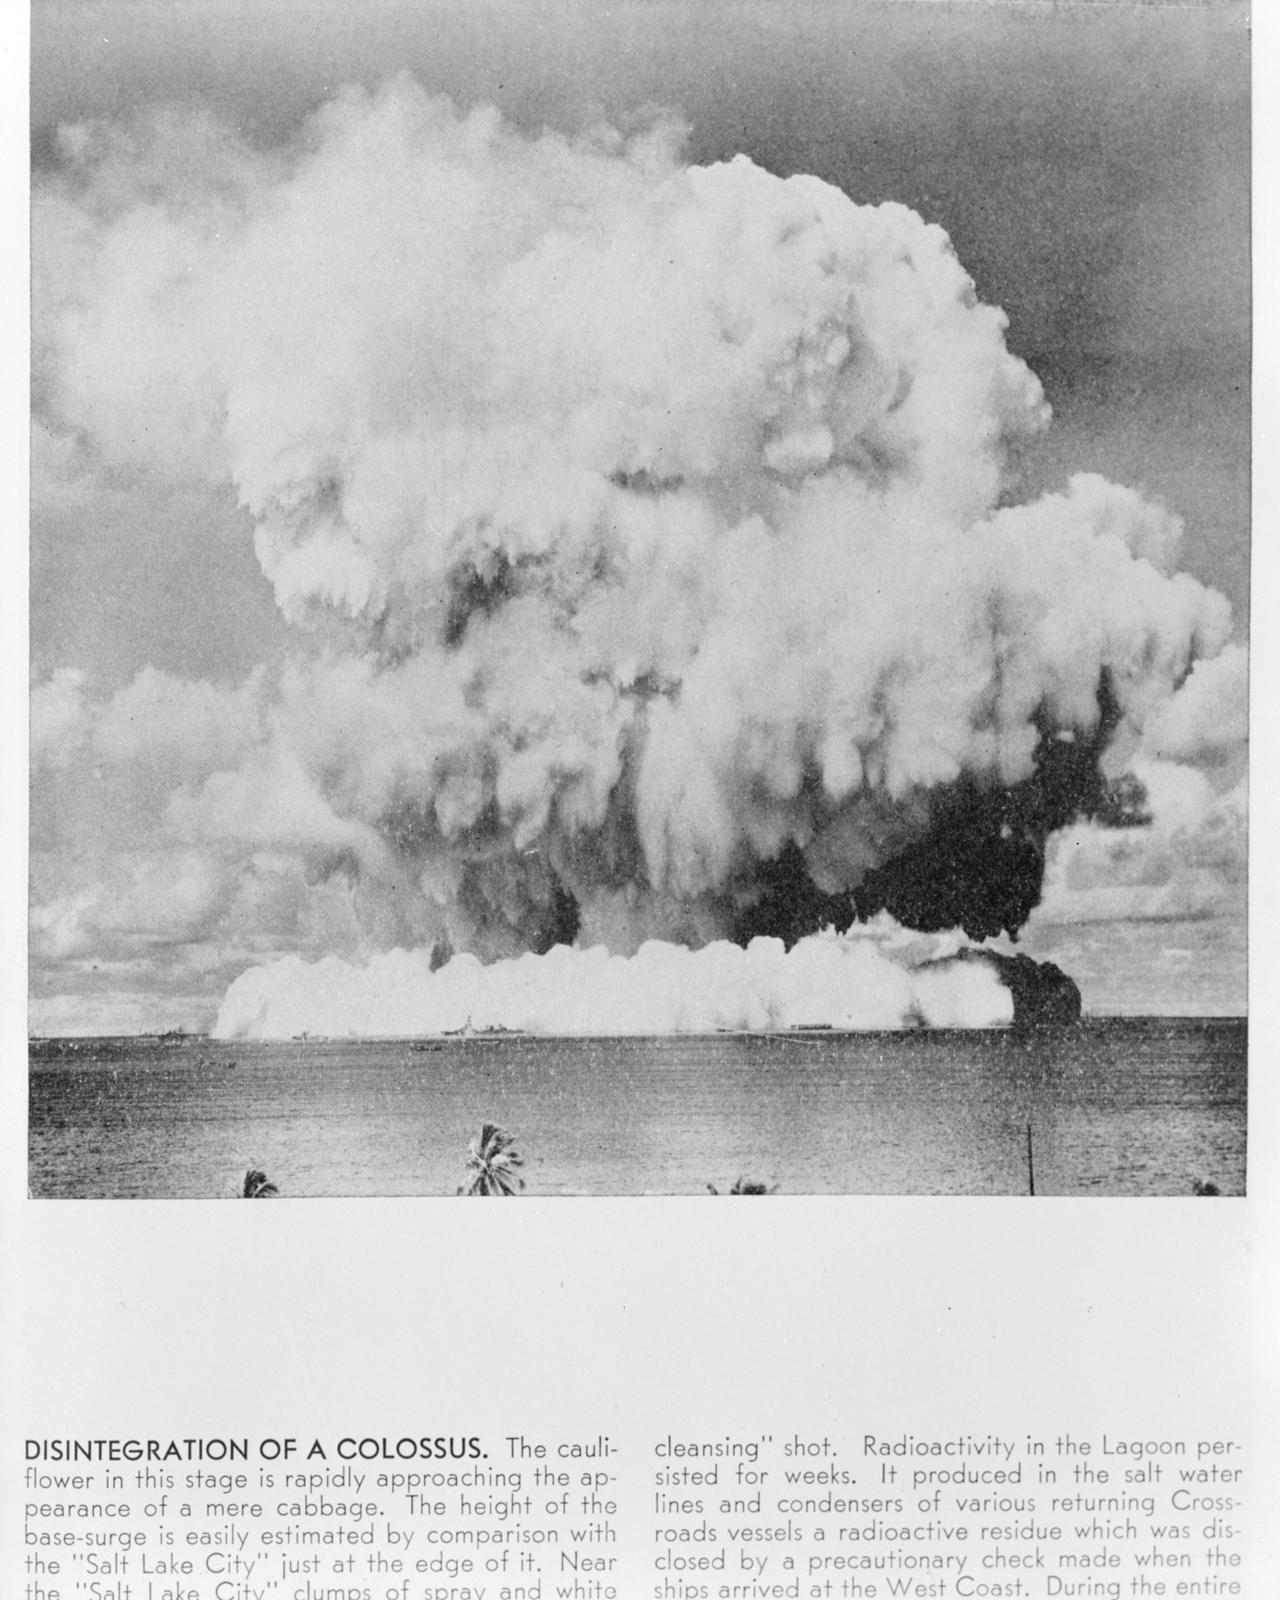 Atomic bomb explosion at Bikini Atoll, Operation Crossroads. Photograph